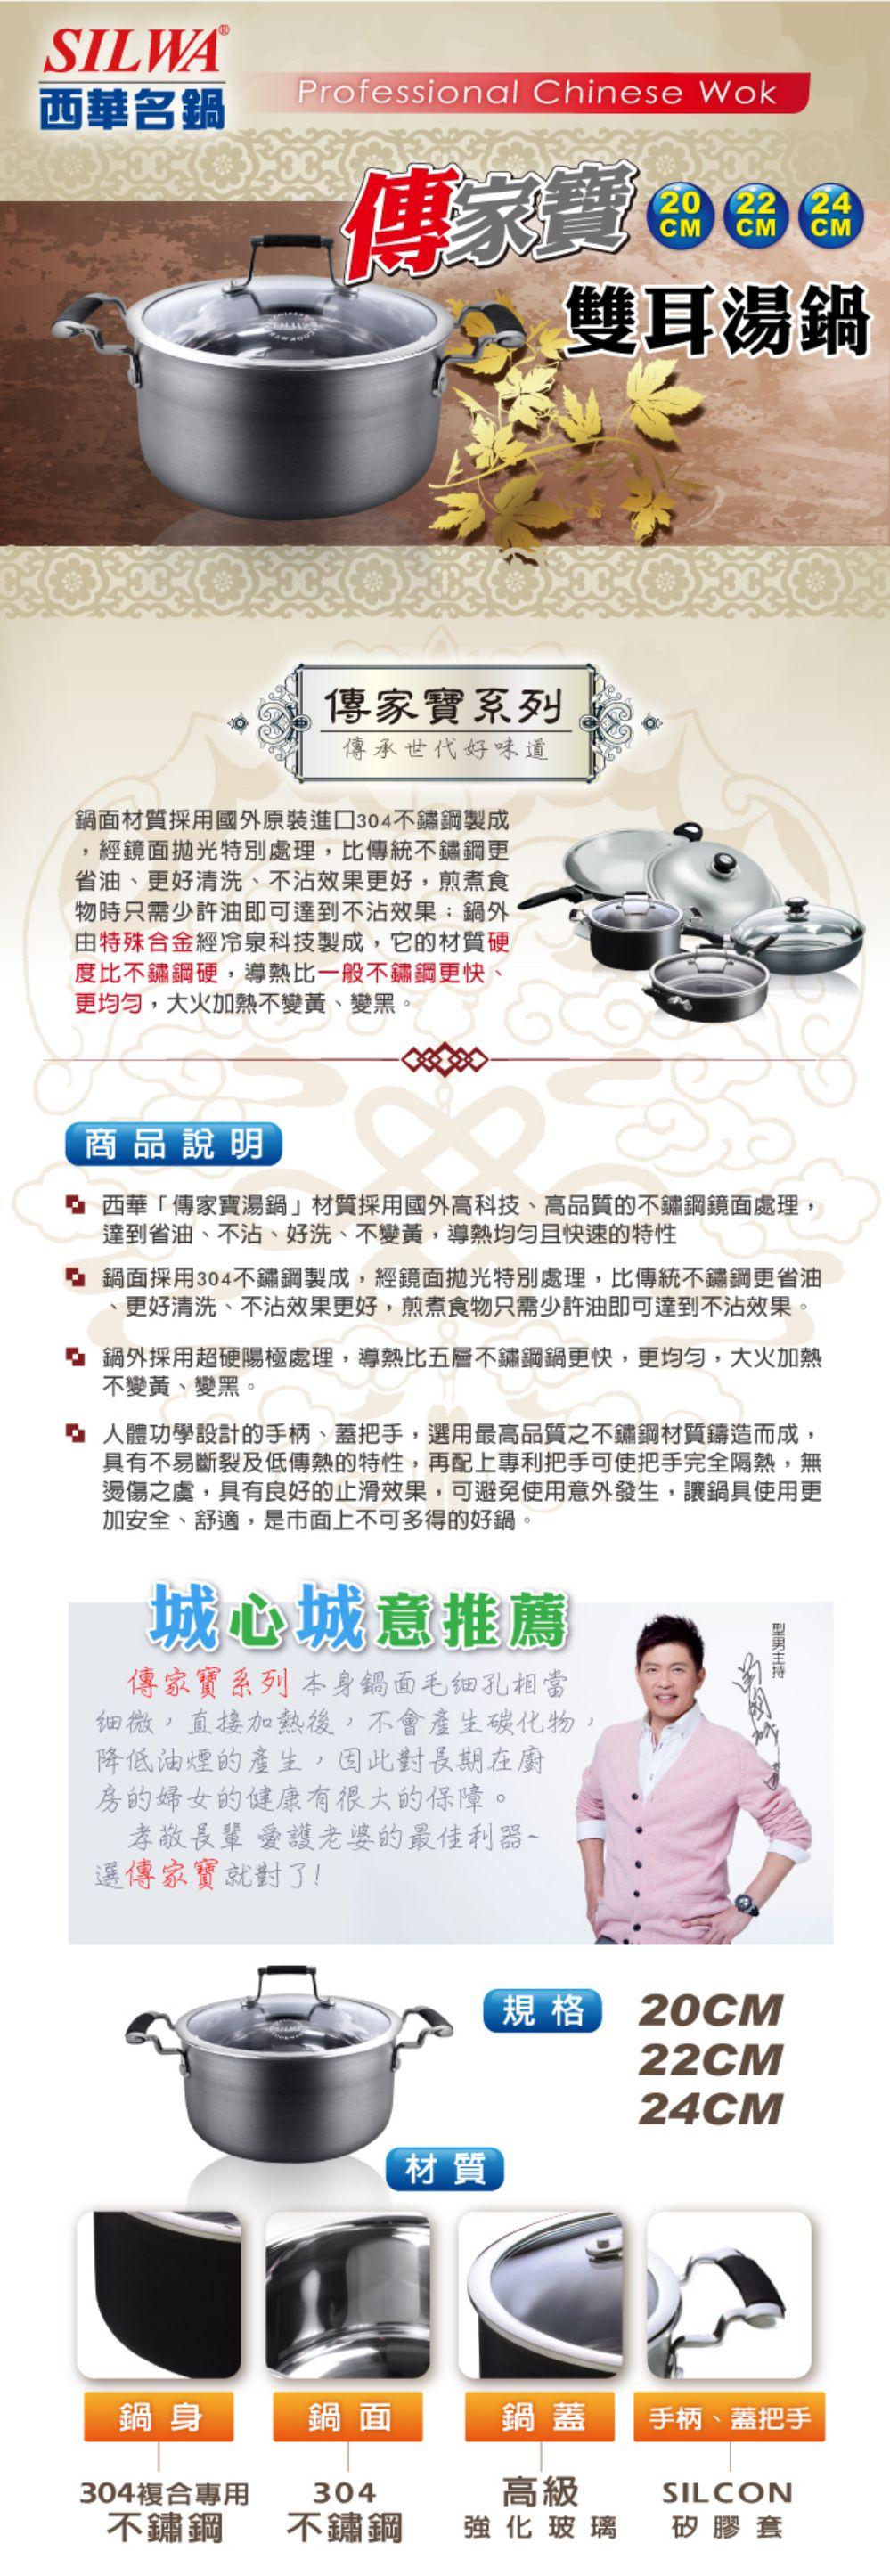 ESW-020HS.ESW-024HS 西華傳家寶複合湯鍋20.24CM